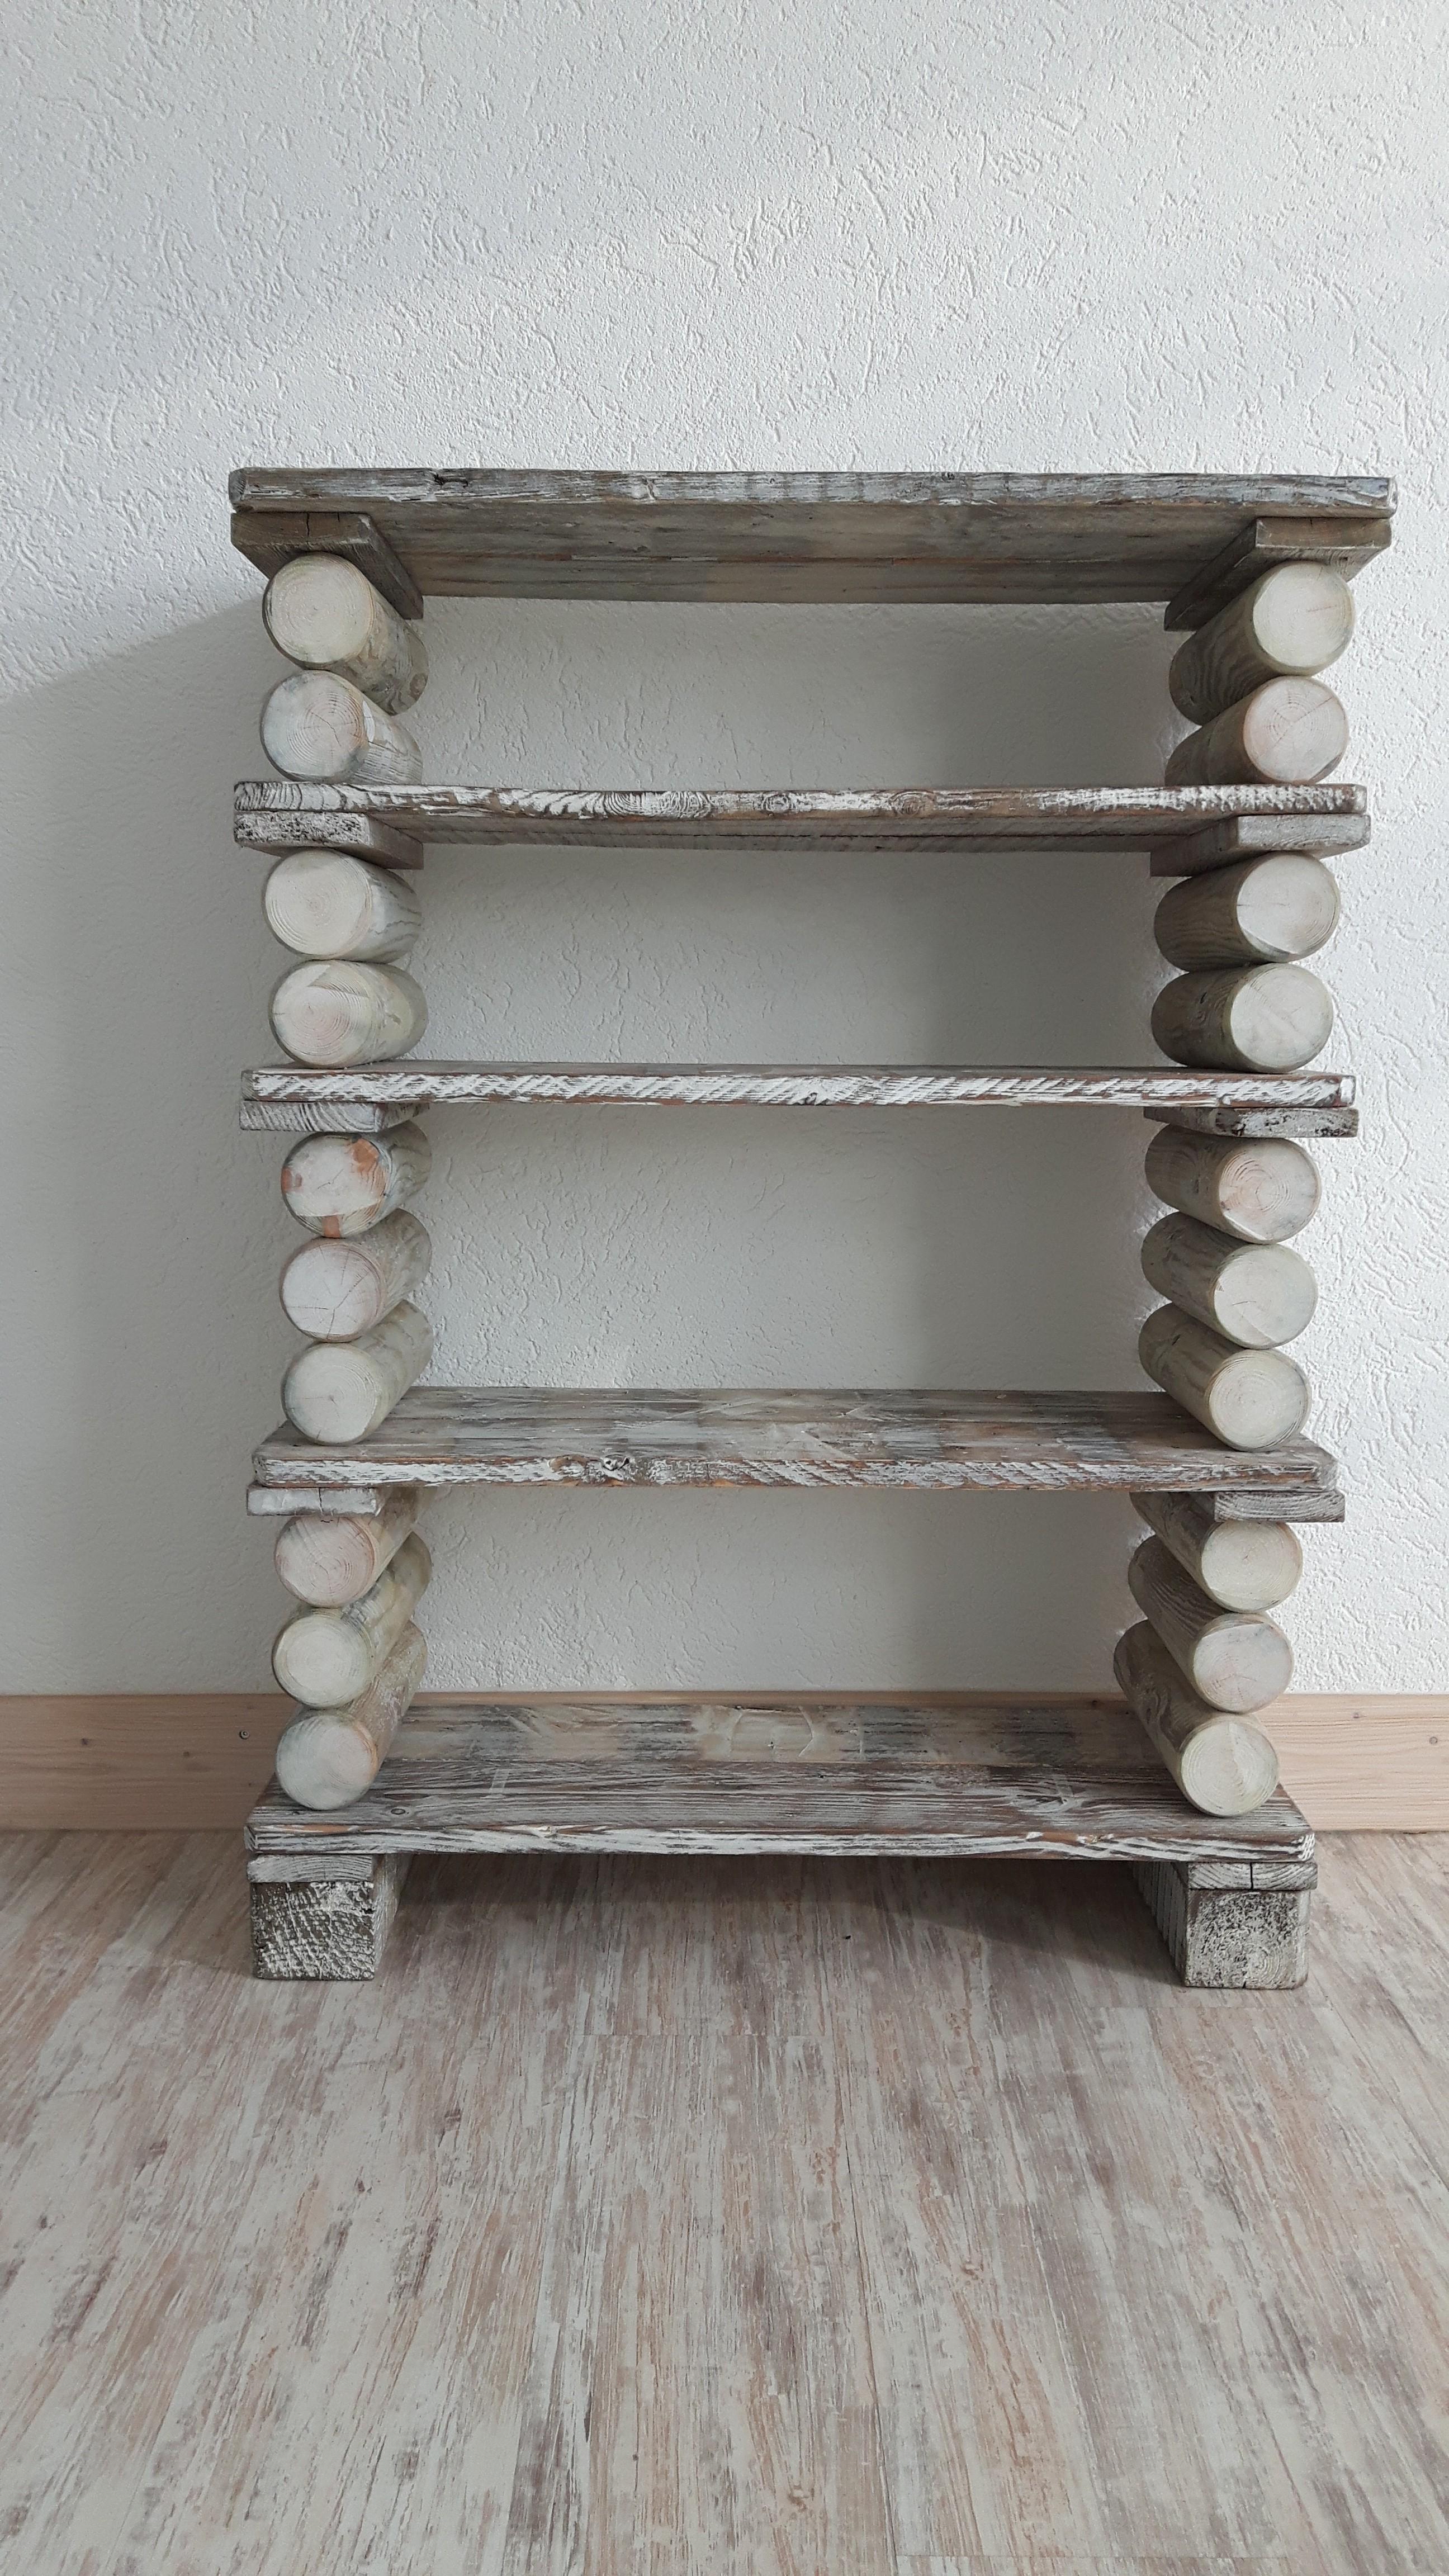 bienenwachs archive woodart by b. Black Bedroom Furniture Sets. Home Design Ideas